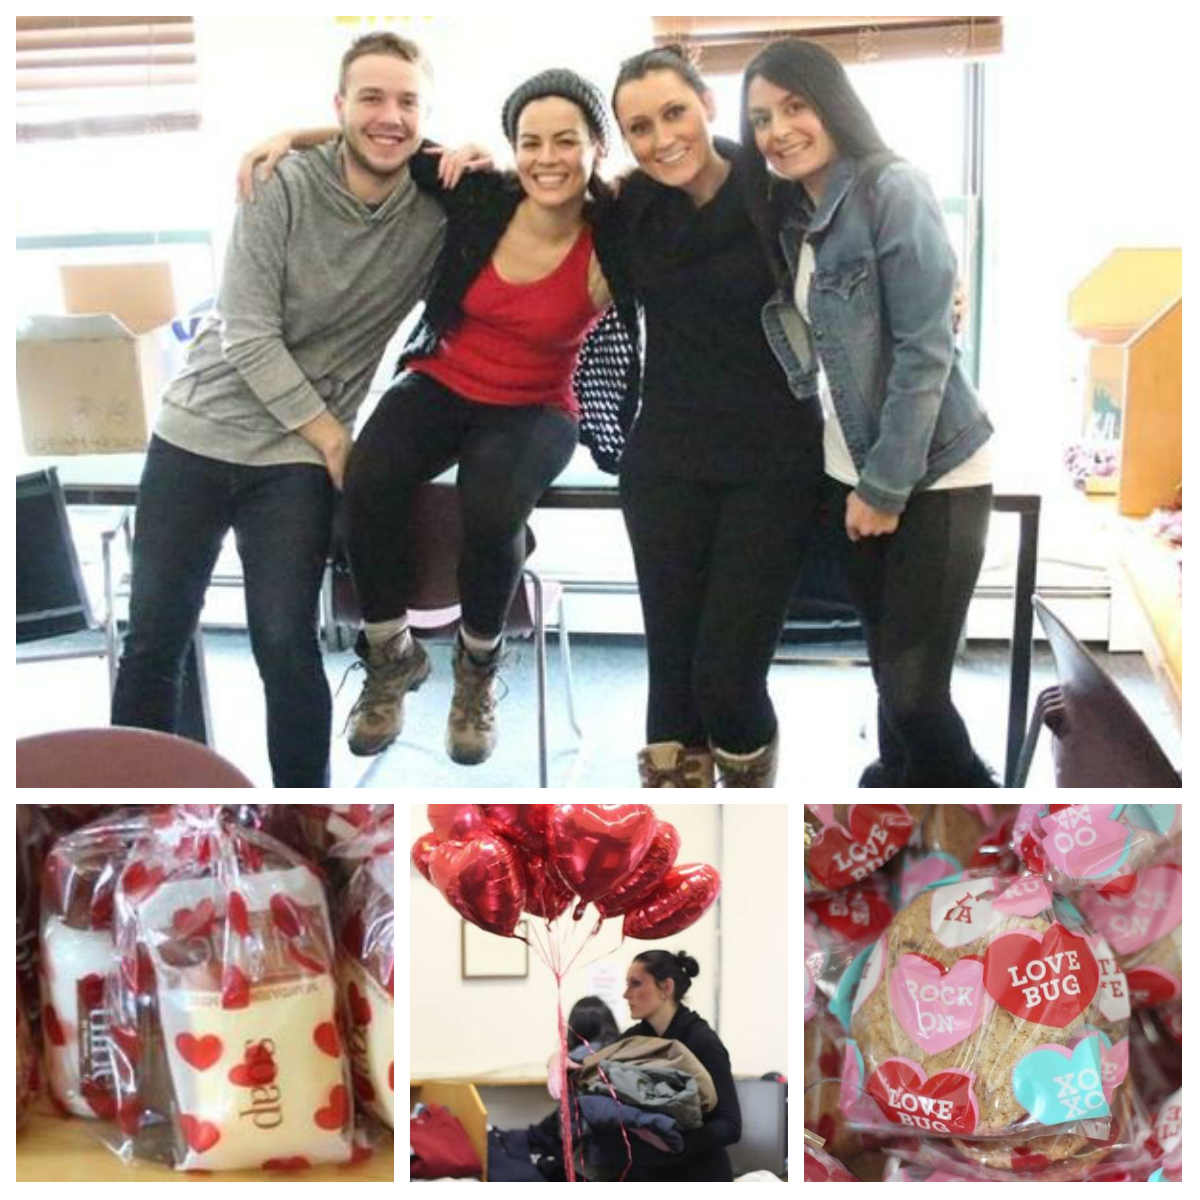 Top photo from right to left:  Bryce Breedyk,Tania Santiago,Katarzyna   Domagala, Heather   Parisi     D'Andrade